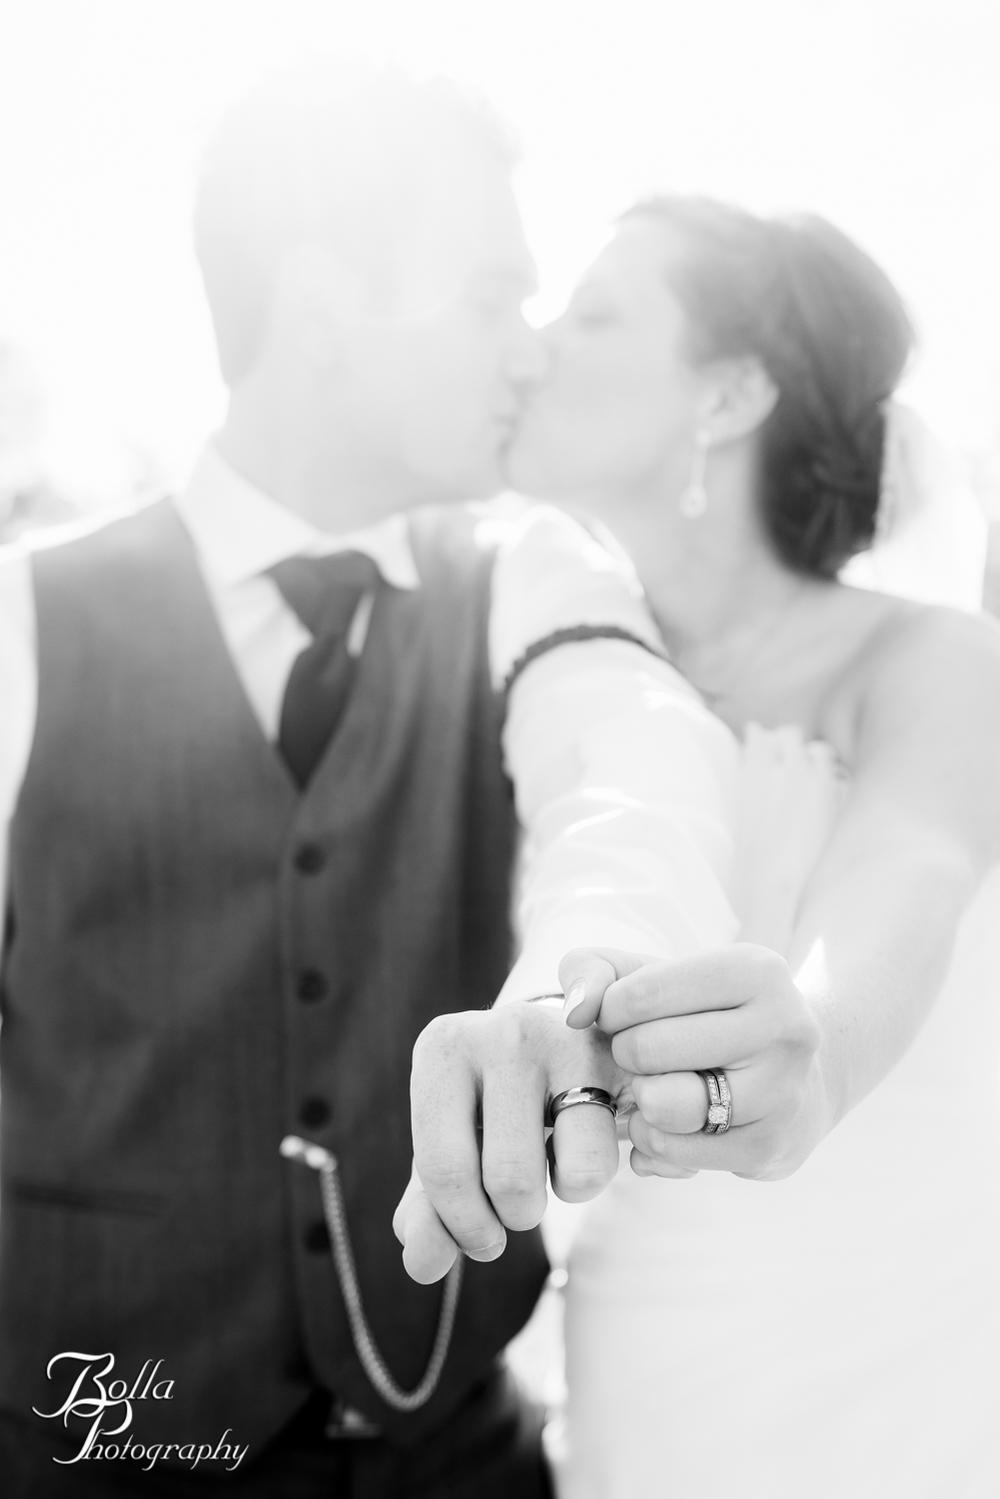 Bolla_Photography_St_Louis_wedding_photographer-0358-2.jpg